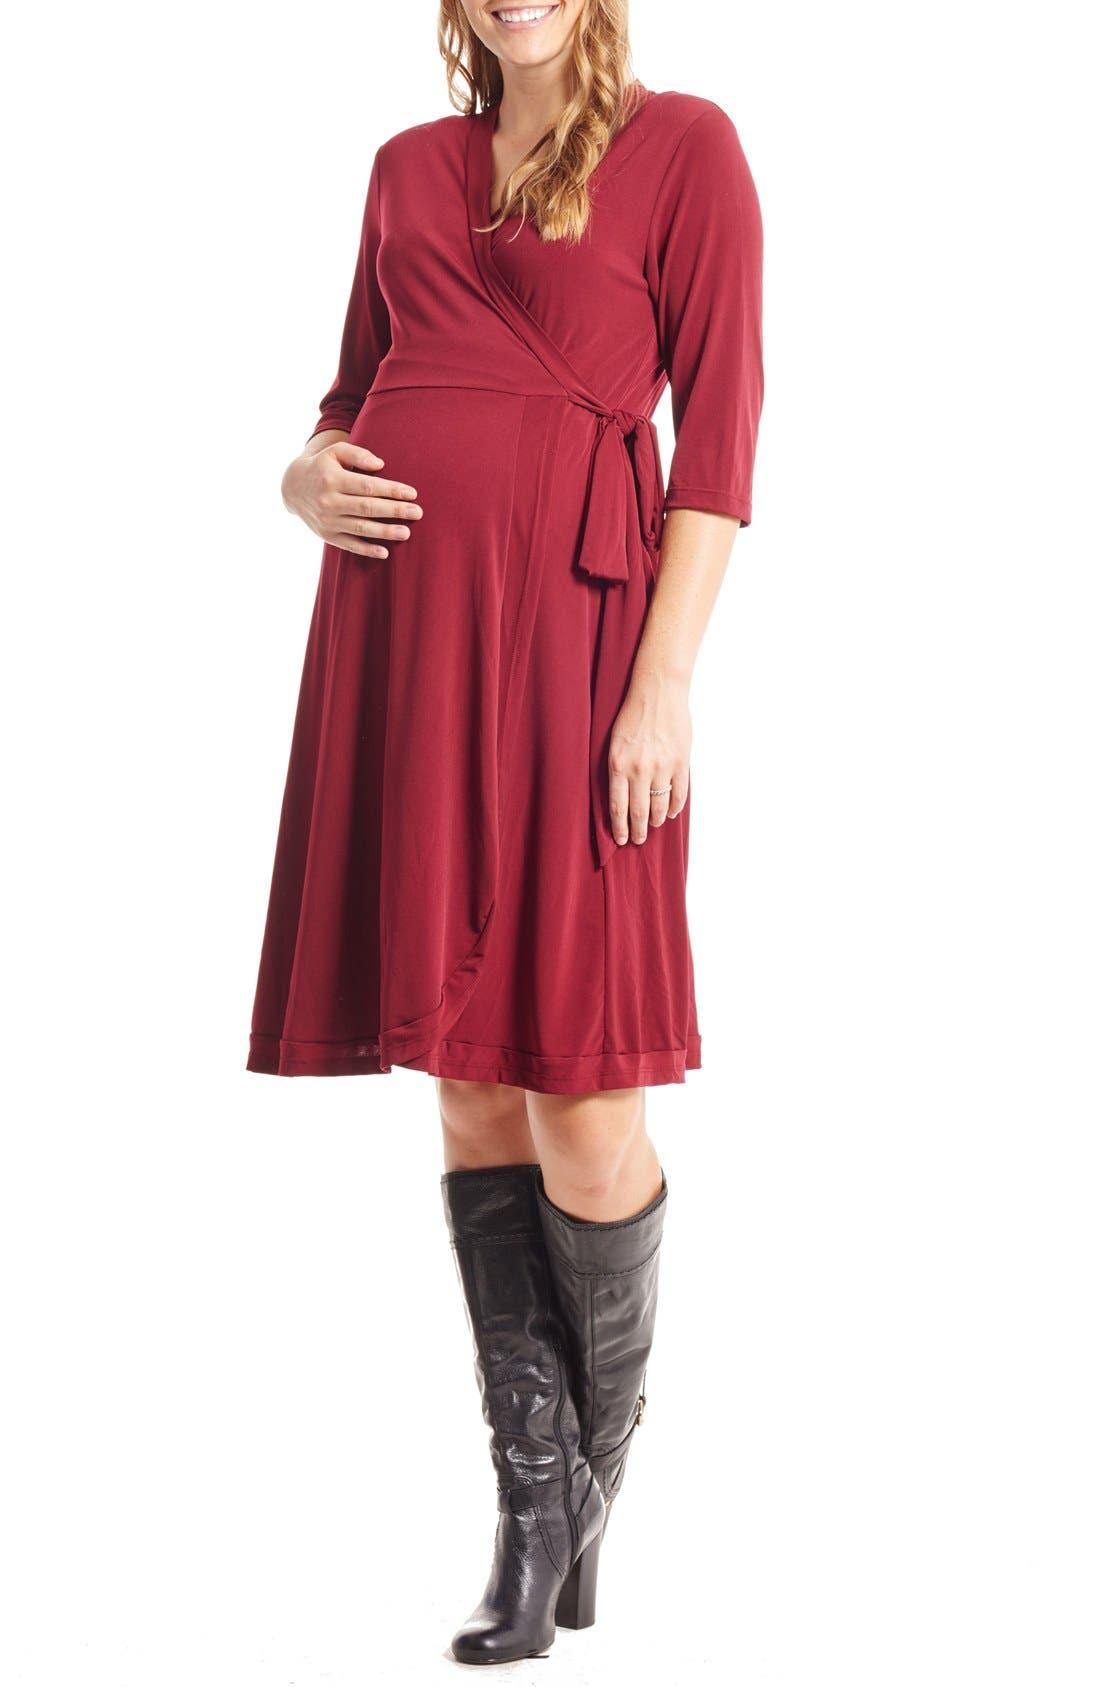 Main Image - Everly Grey Mila Wrap Maternity/Nursing Dress